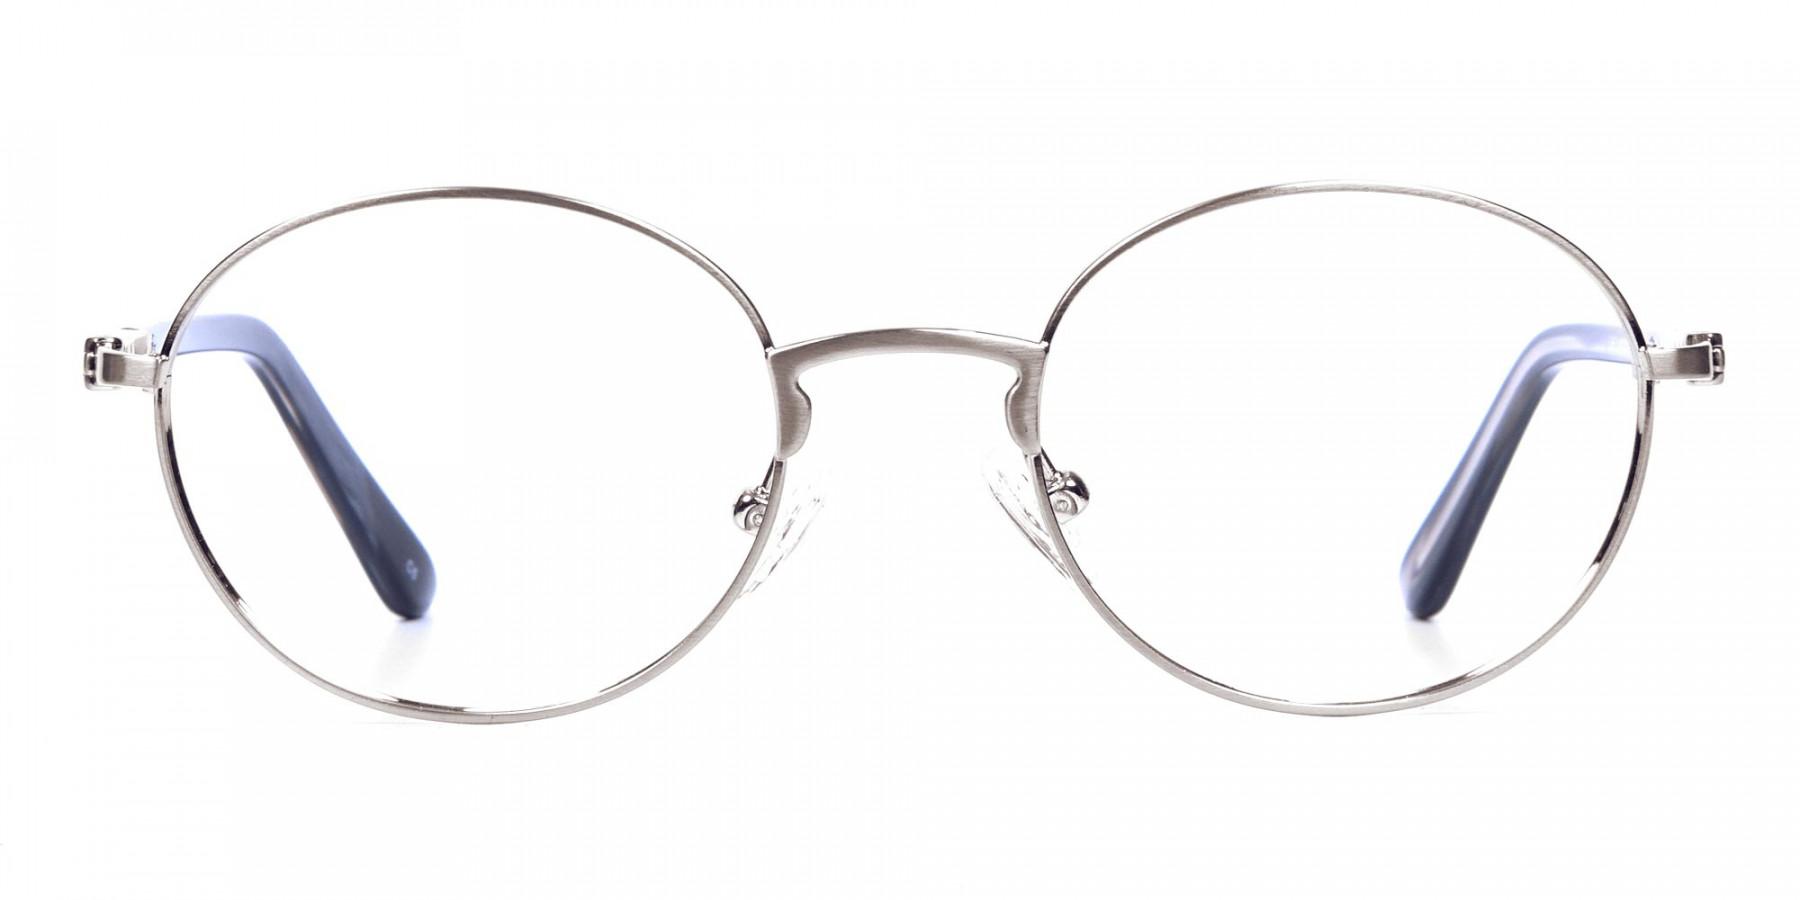 Round Glasses in Gunmetal, Eyeglasses - 1